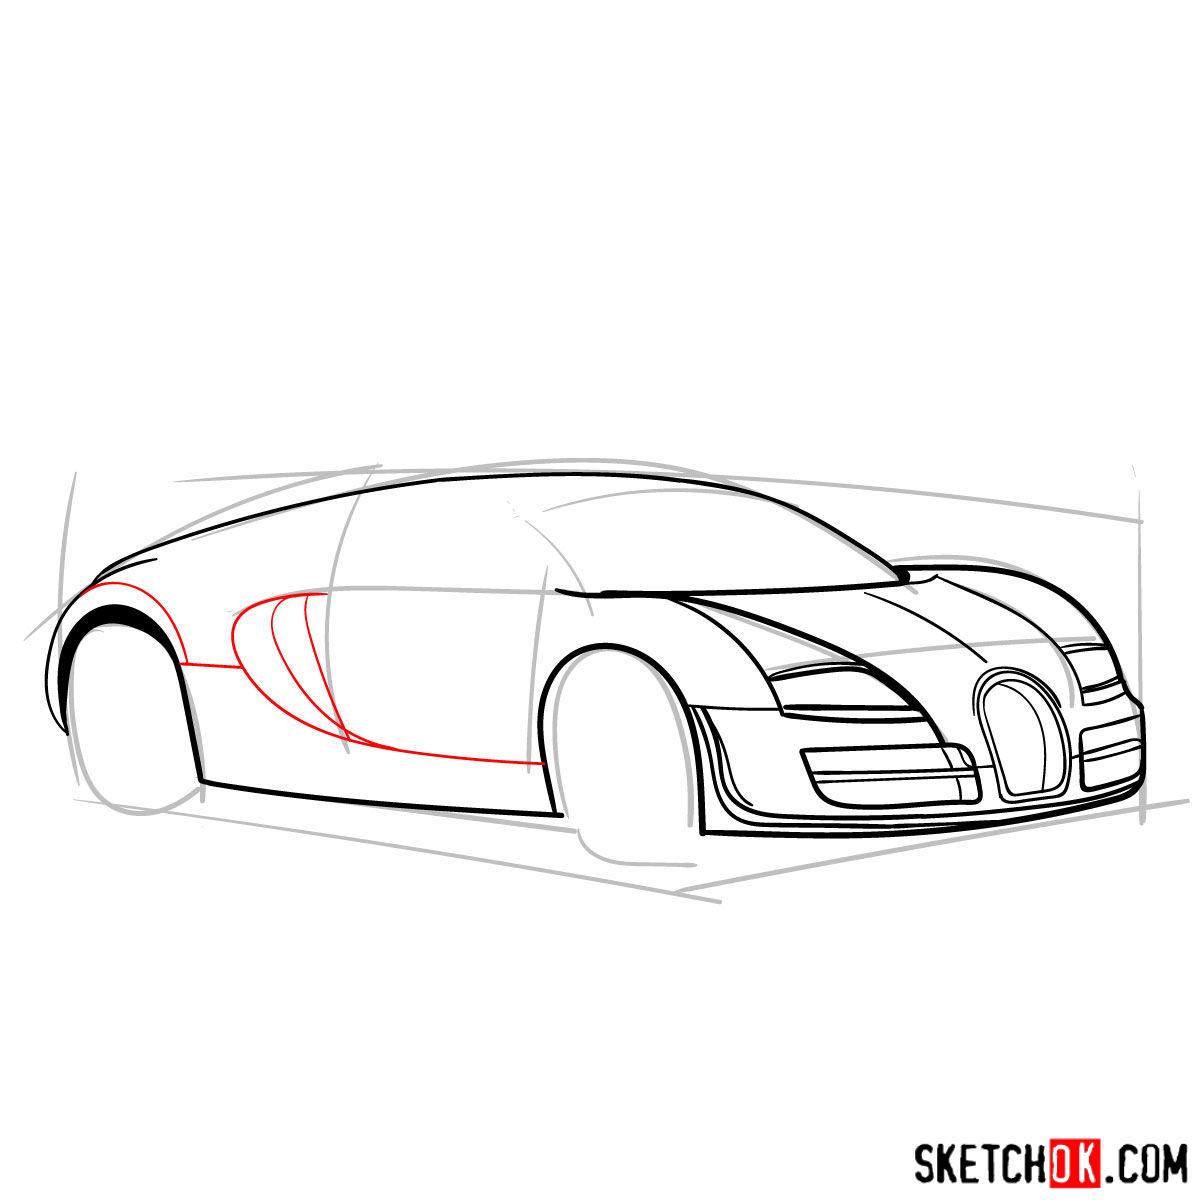 How to draw Bugatti Veyron 16.4 Super Sport - step 07